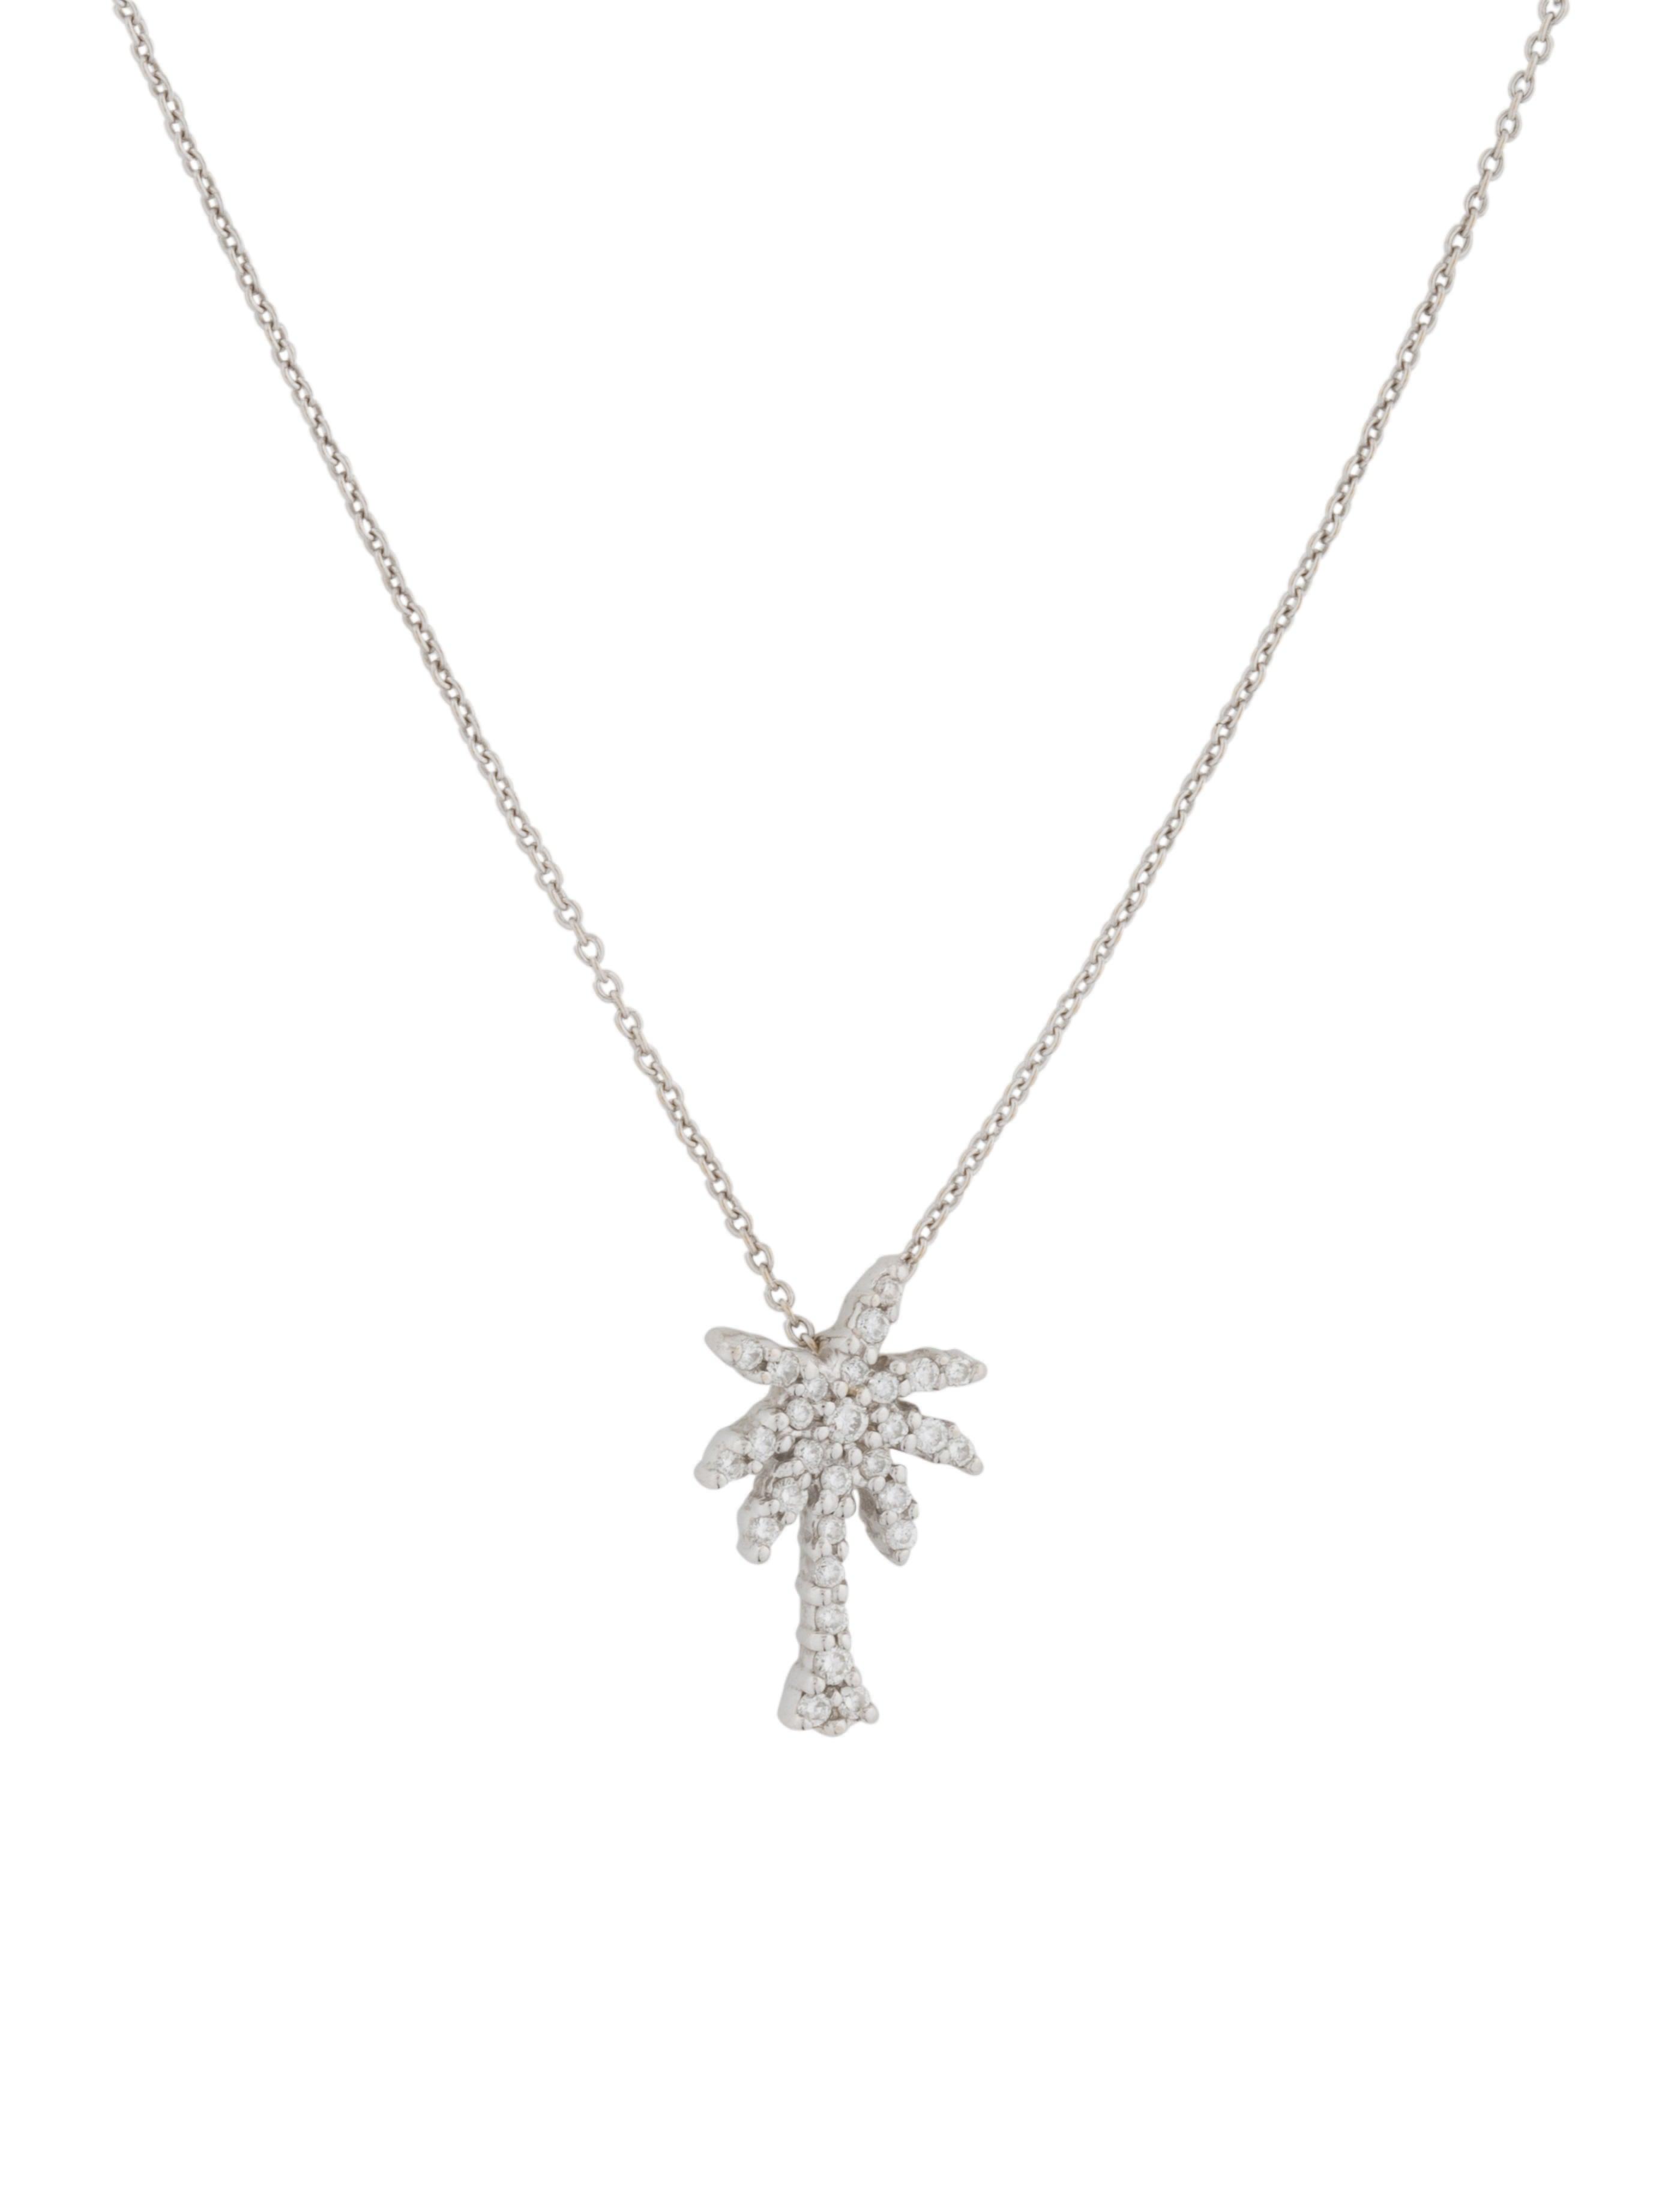 Roberto coin 18k diamond palm tree pendant necklace necklaces 18k diamond palm tree pendant necklace aloadofball Images